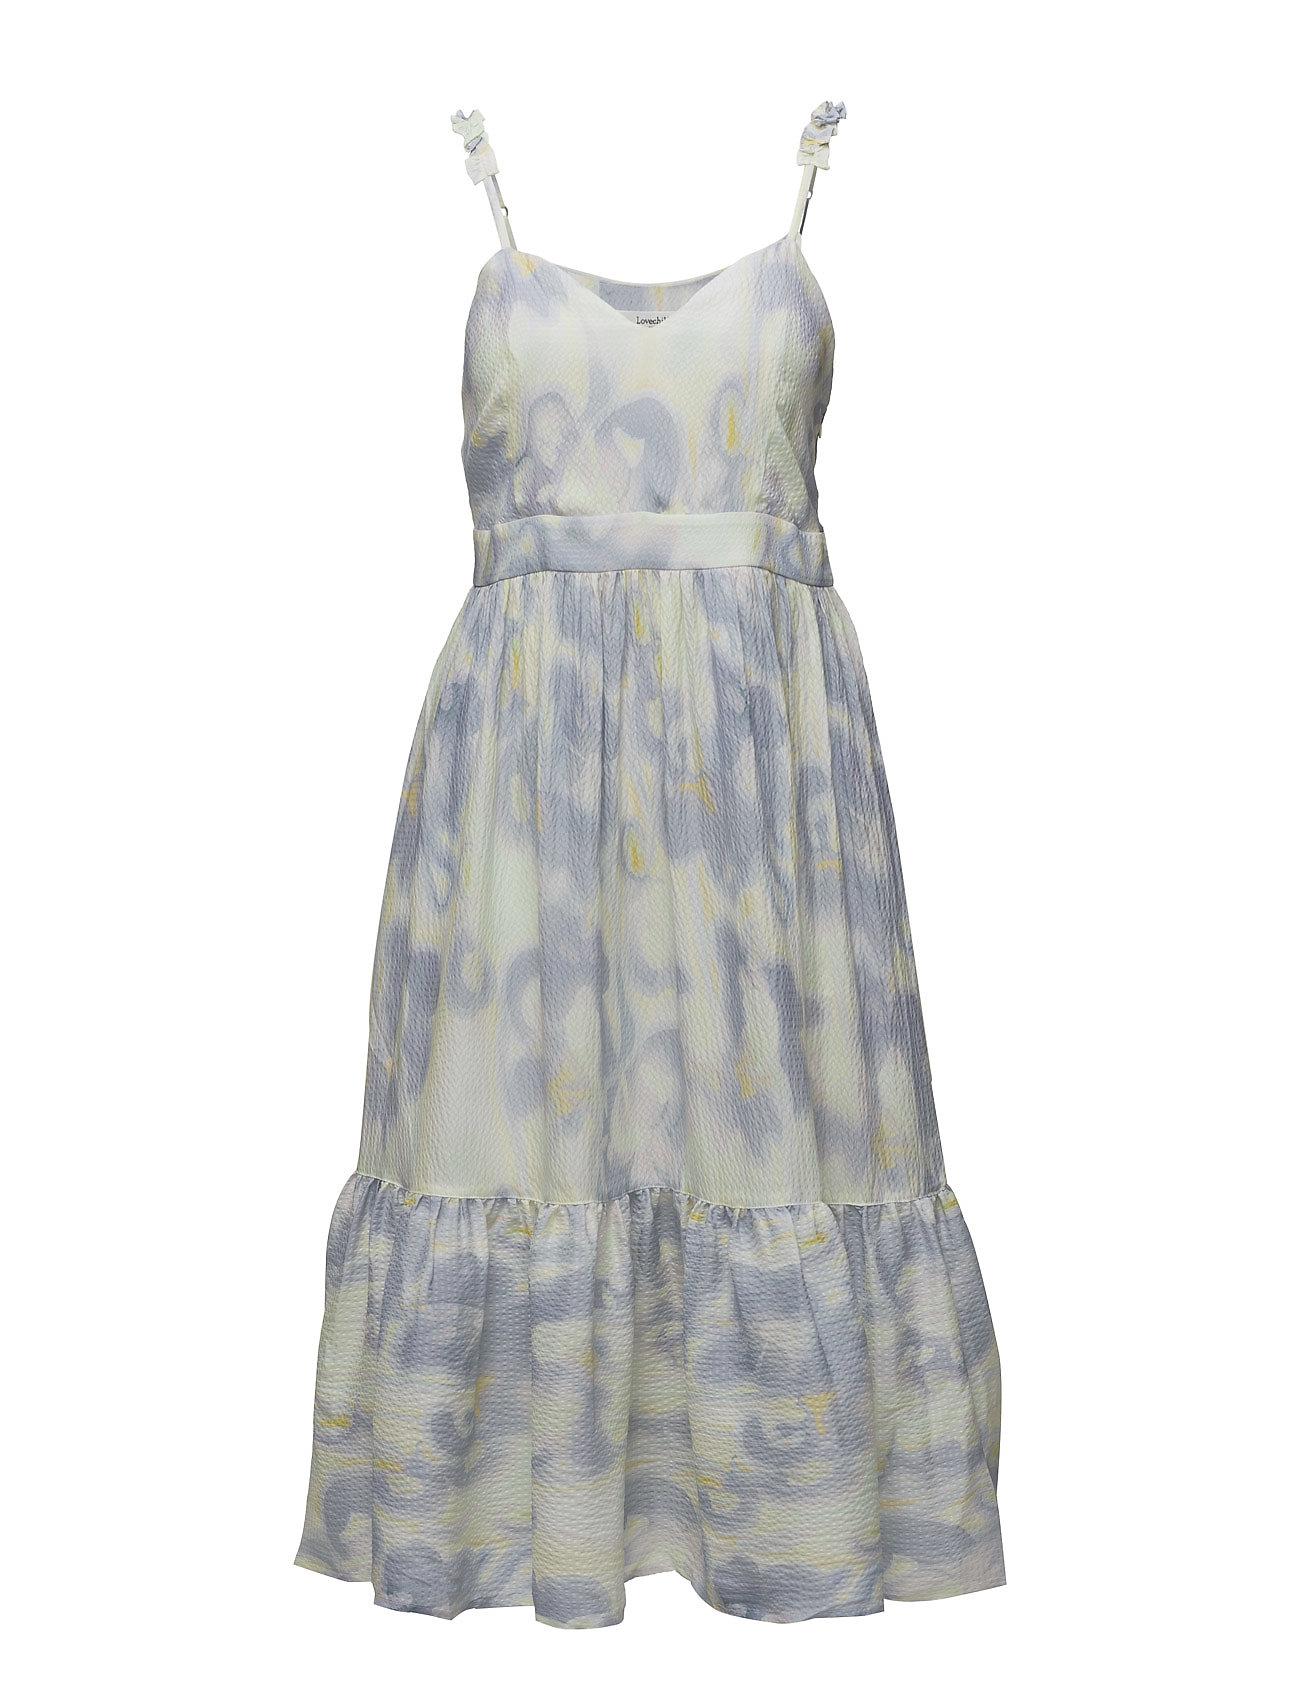 Lovechild 1979 Adalie Dress